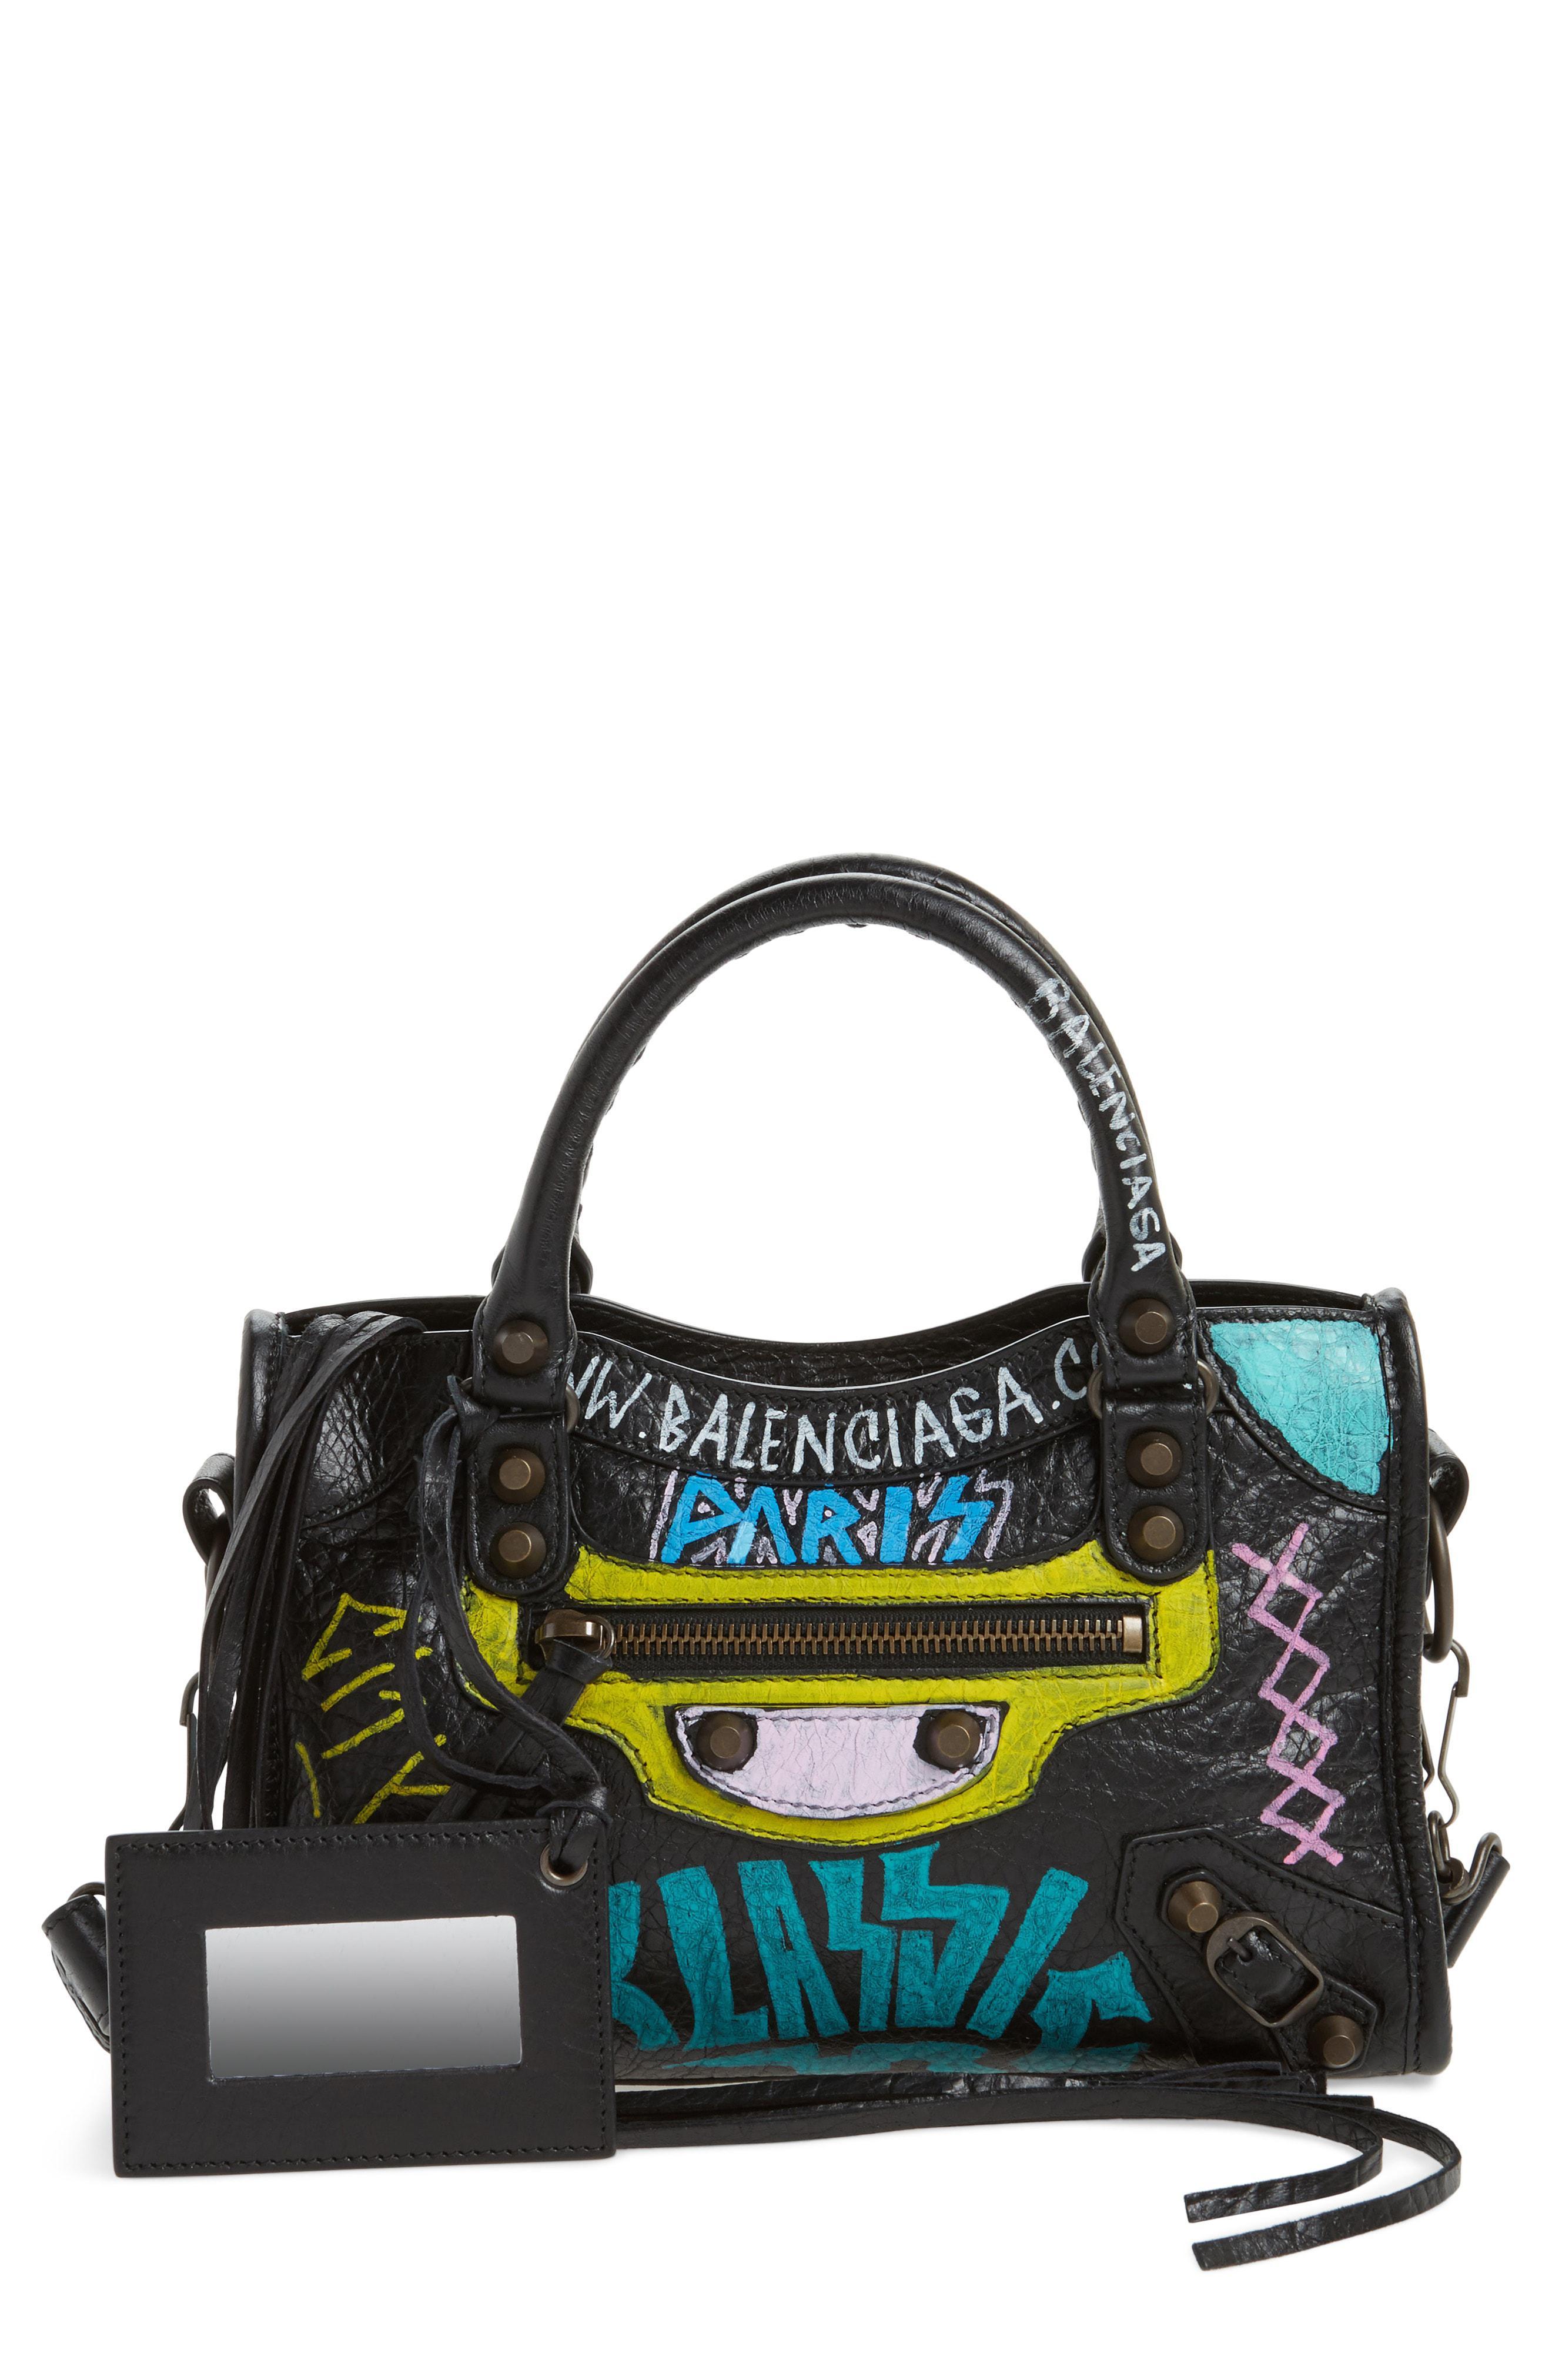 1c0d6ace6e Balenciaga Mini City Graffiti Leather Tote - Lyst